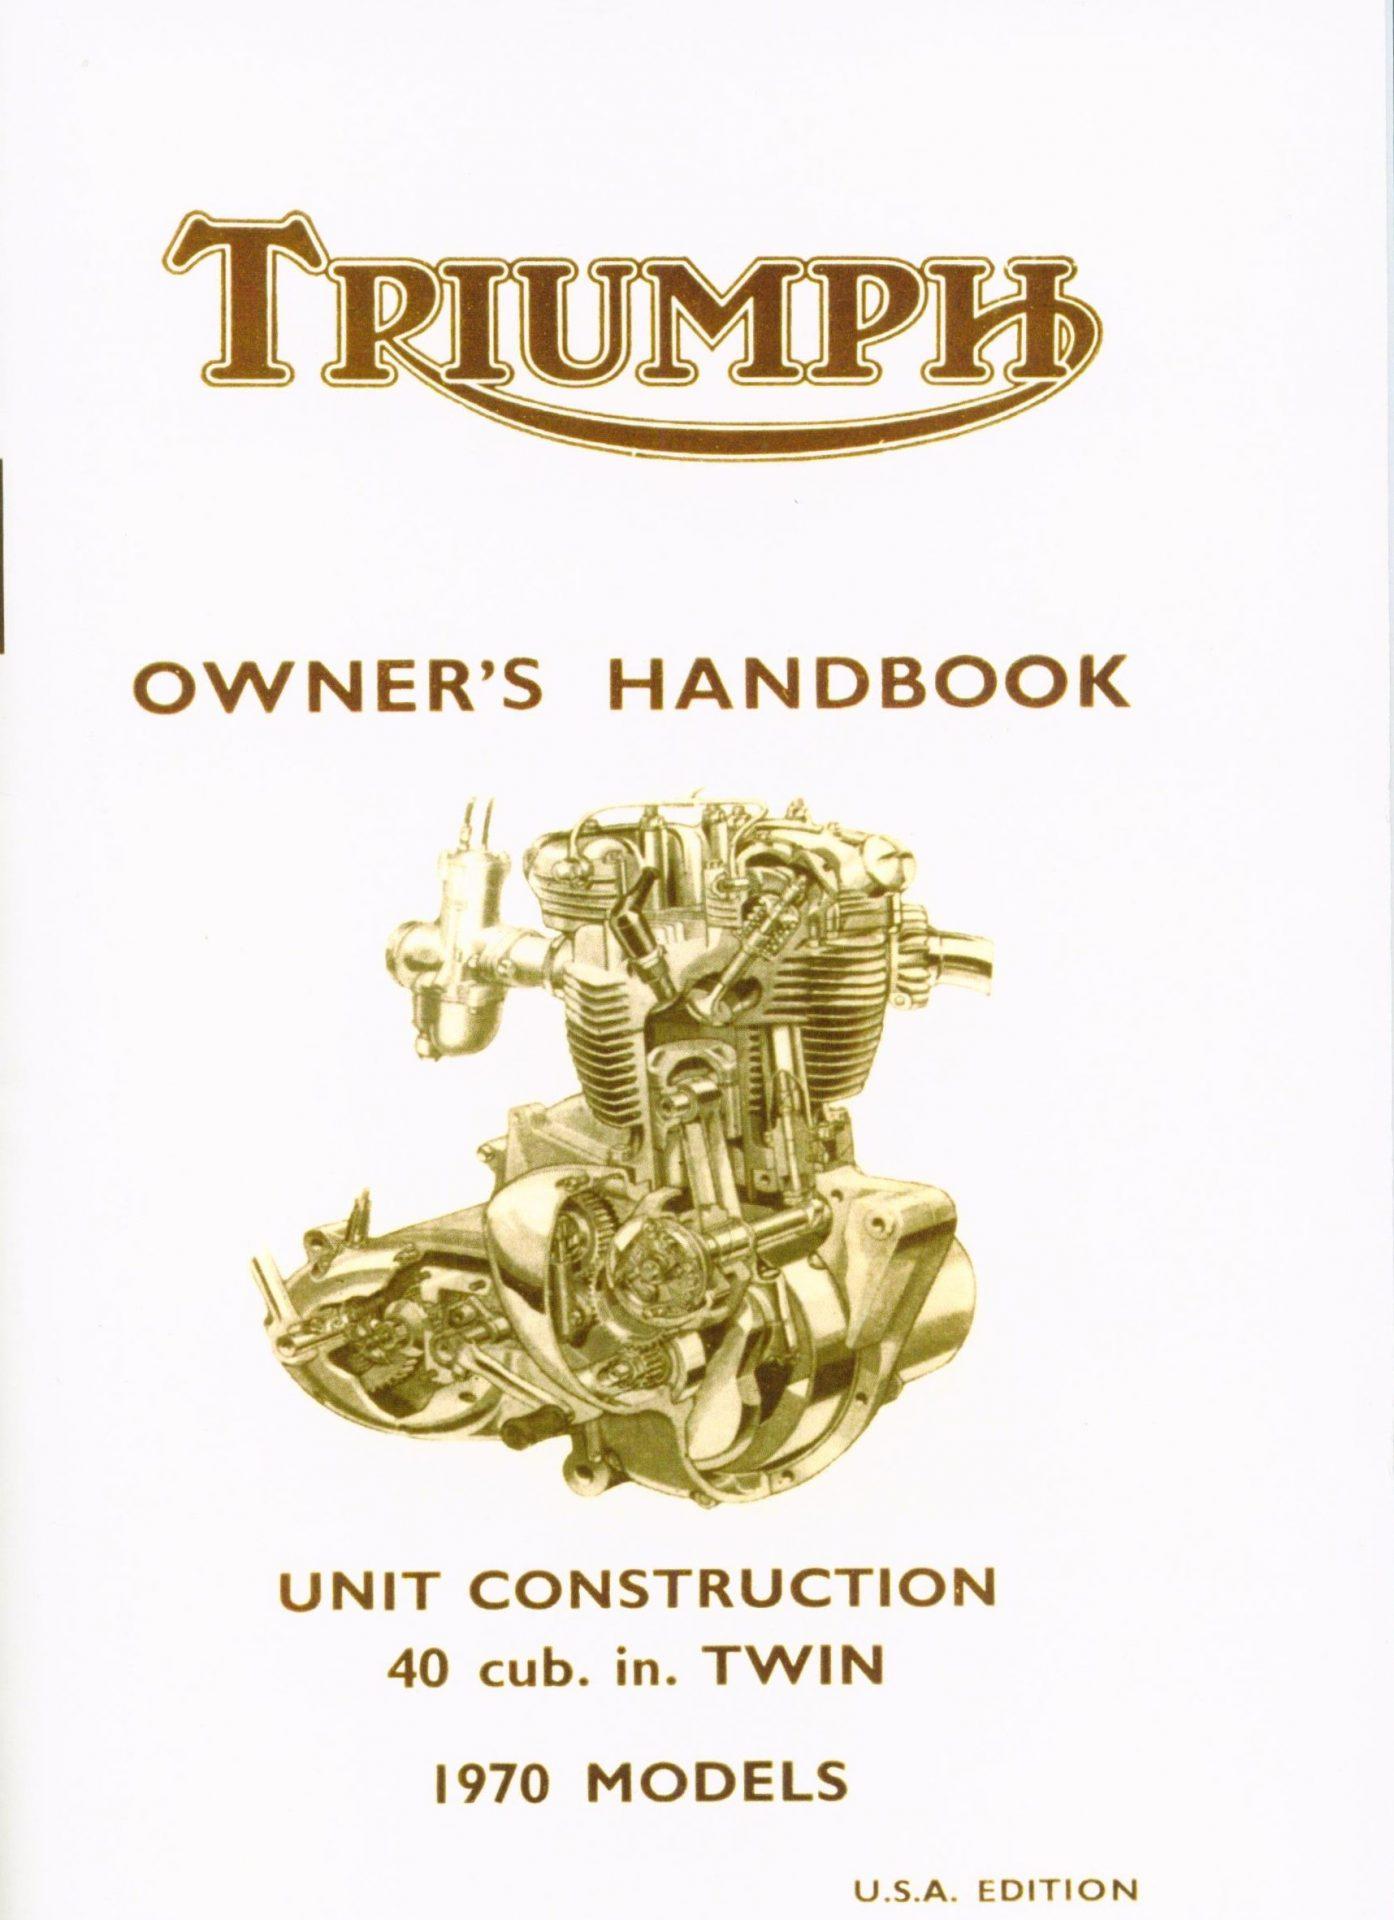 Triumph T120 Handbook 1970 Usa Tiger Trophy 650 Models